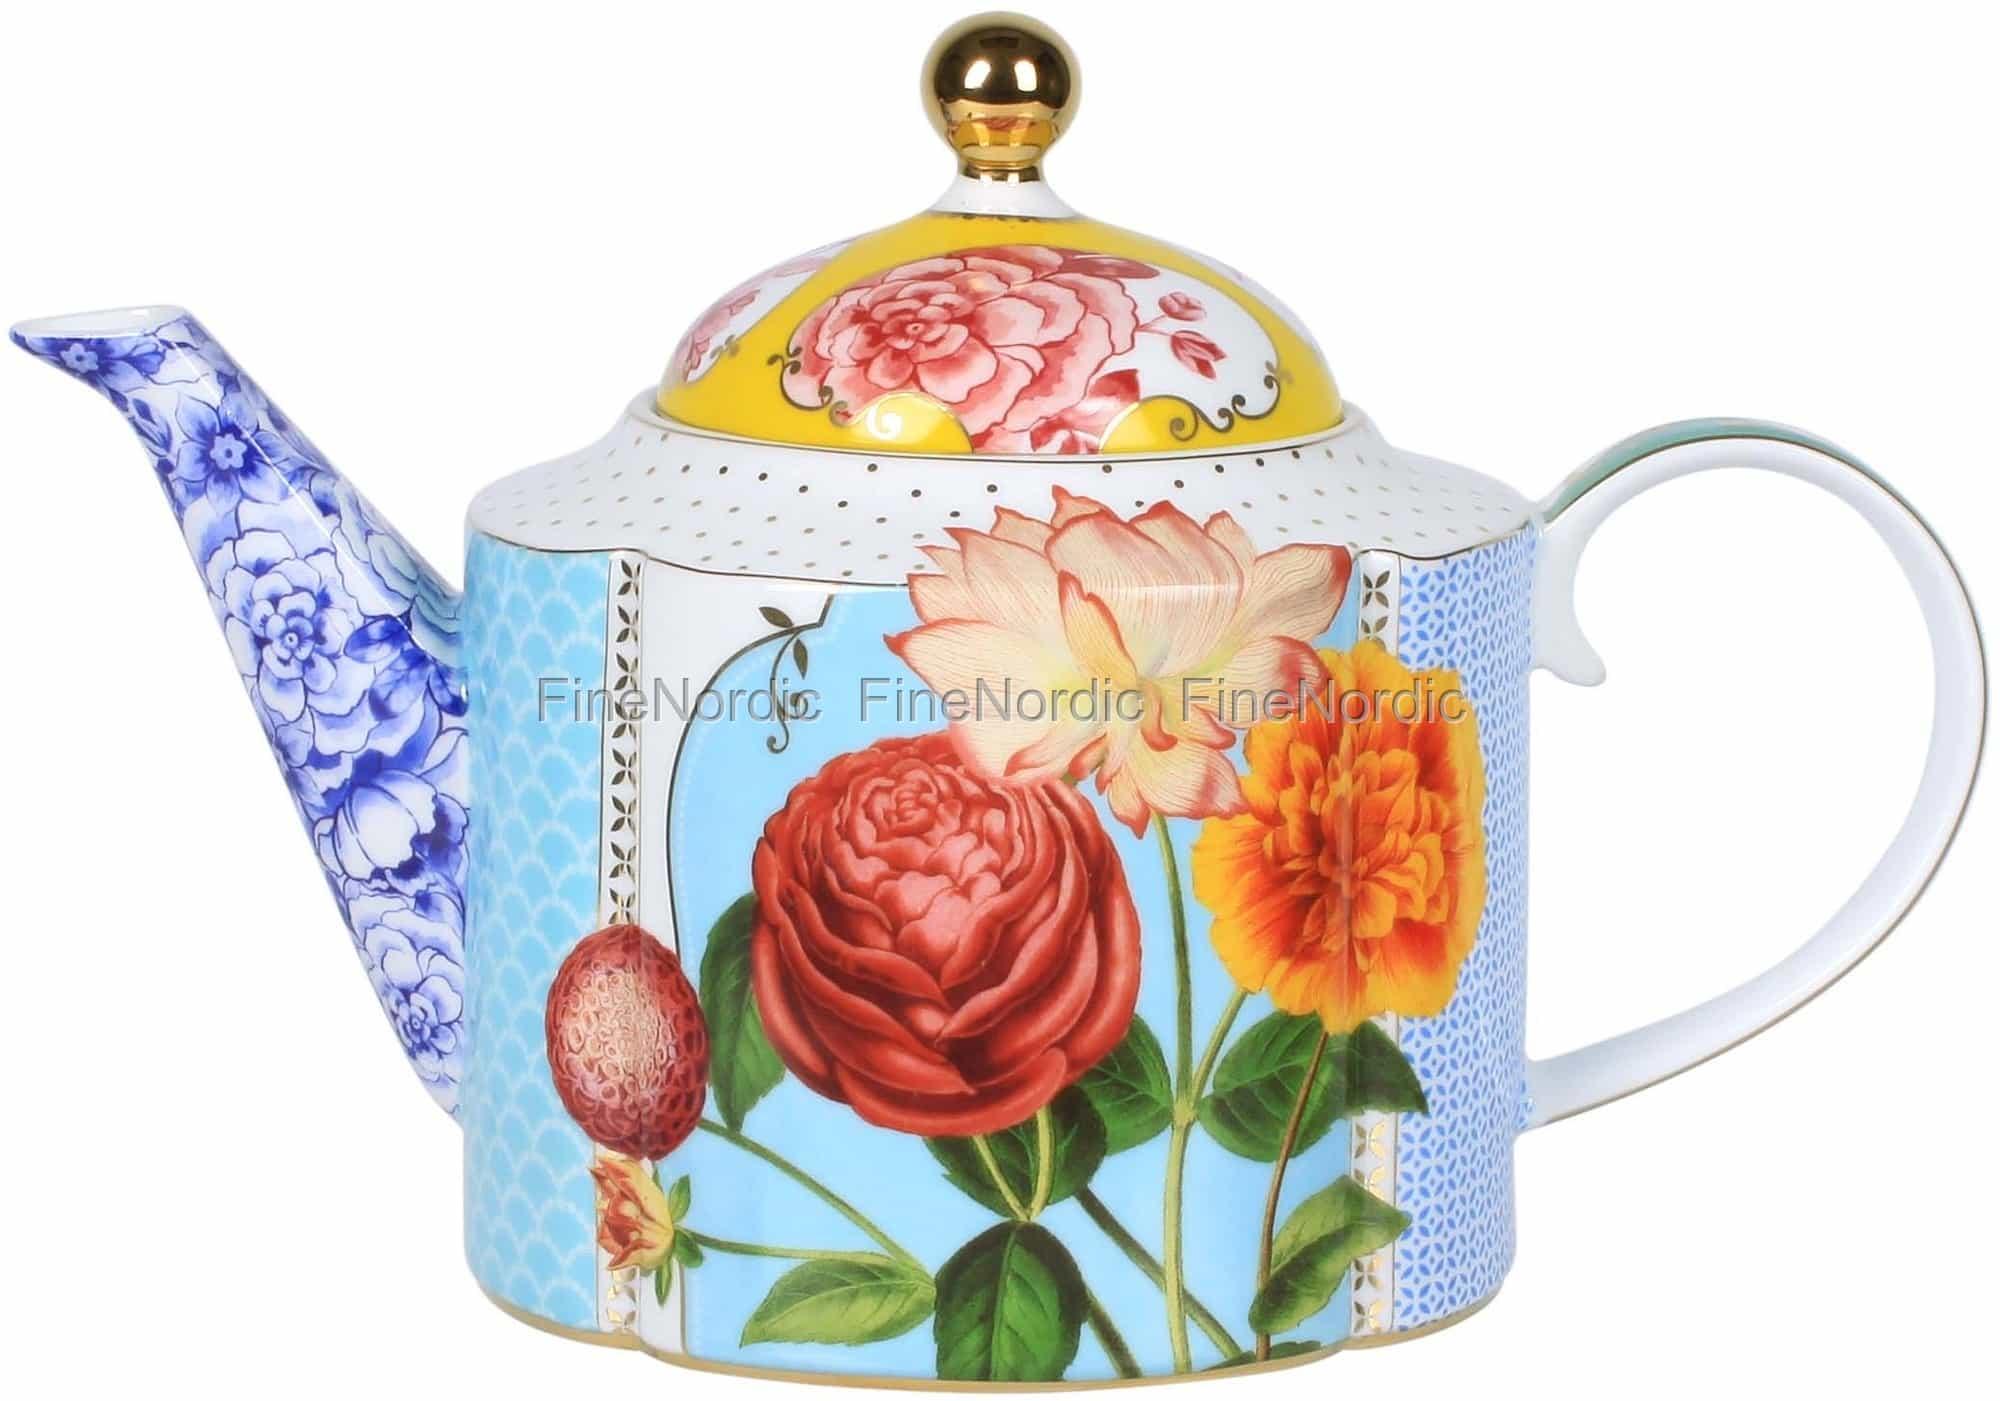 https://images.finenordic.com/image/41601-large-1543720997/pip-studio-royal-teapot-multicoloured.jpg